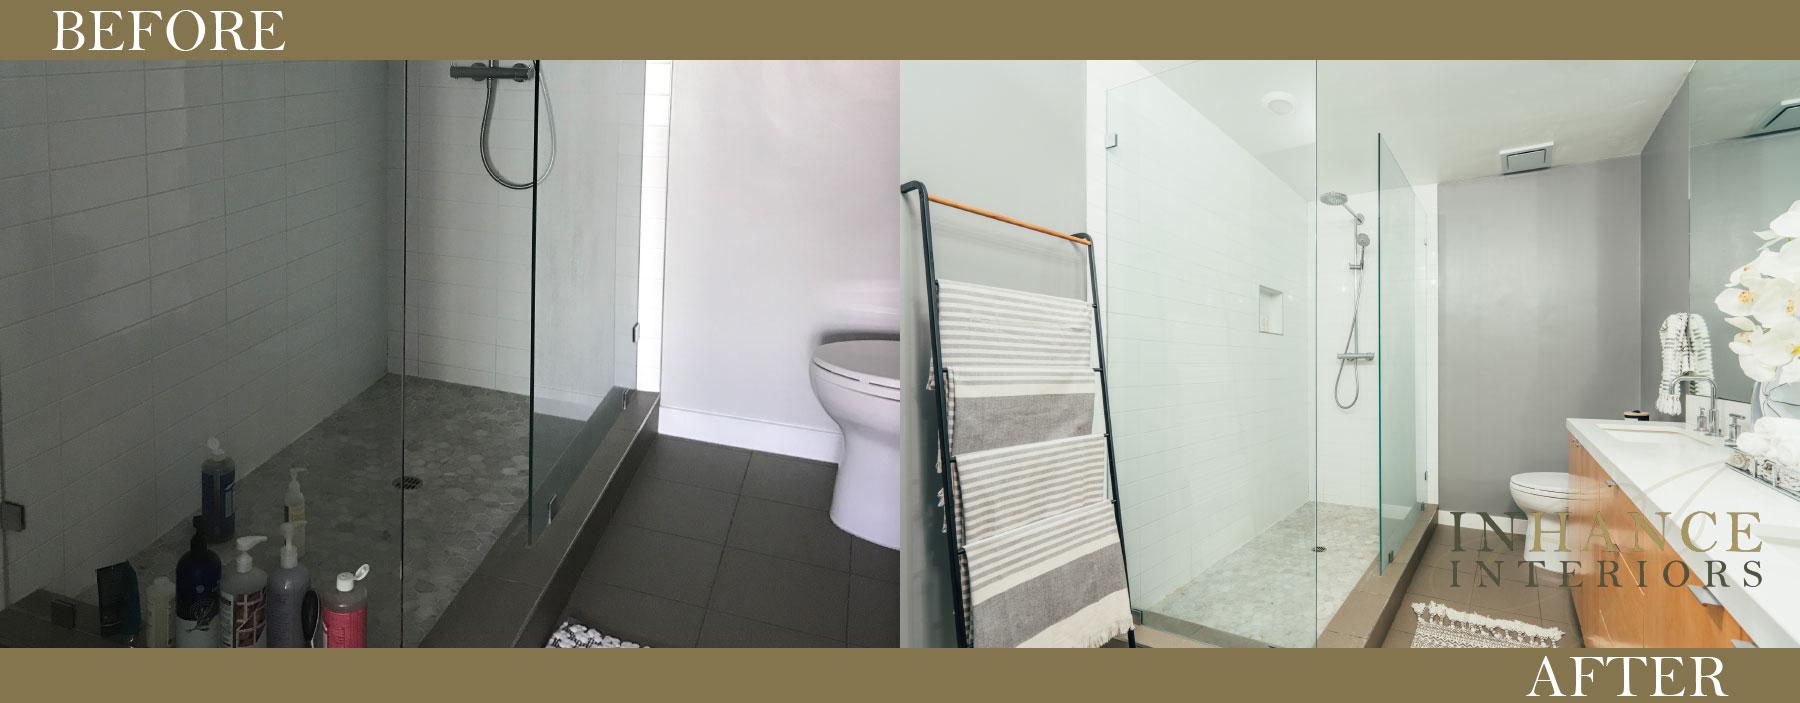 Nebraska_BeforeAfter_Bathroom.jpg